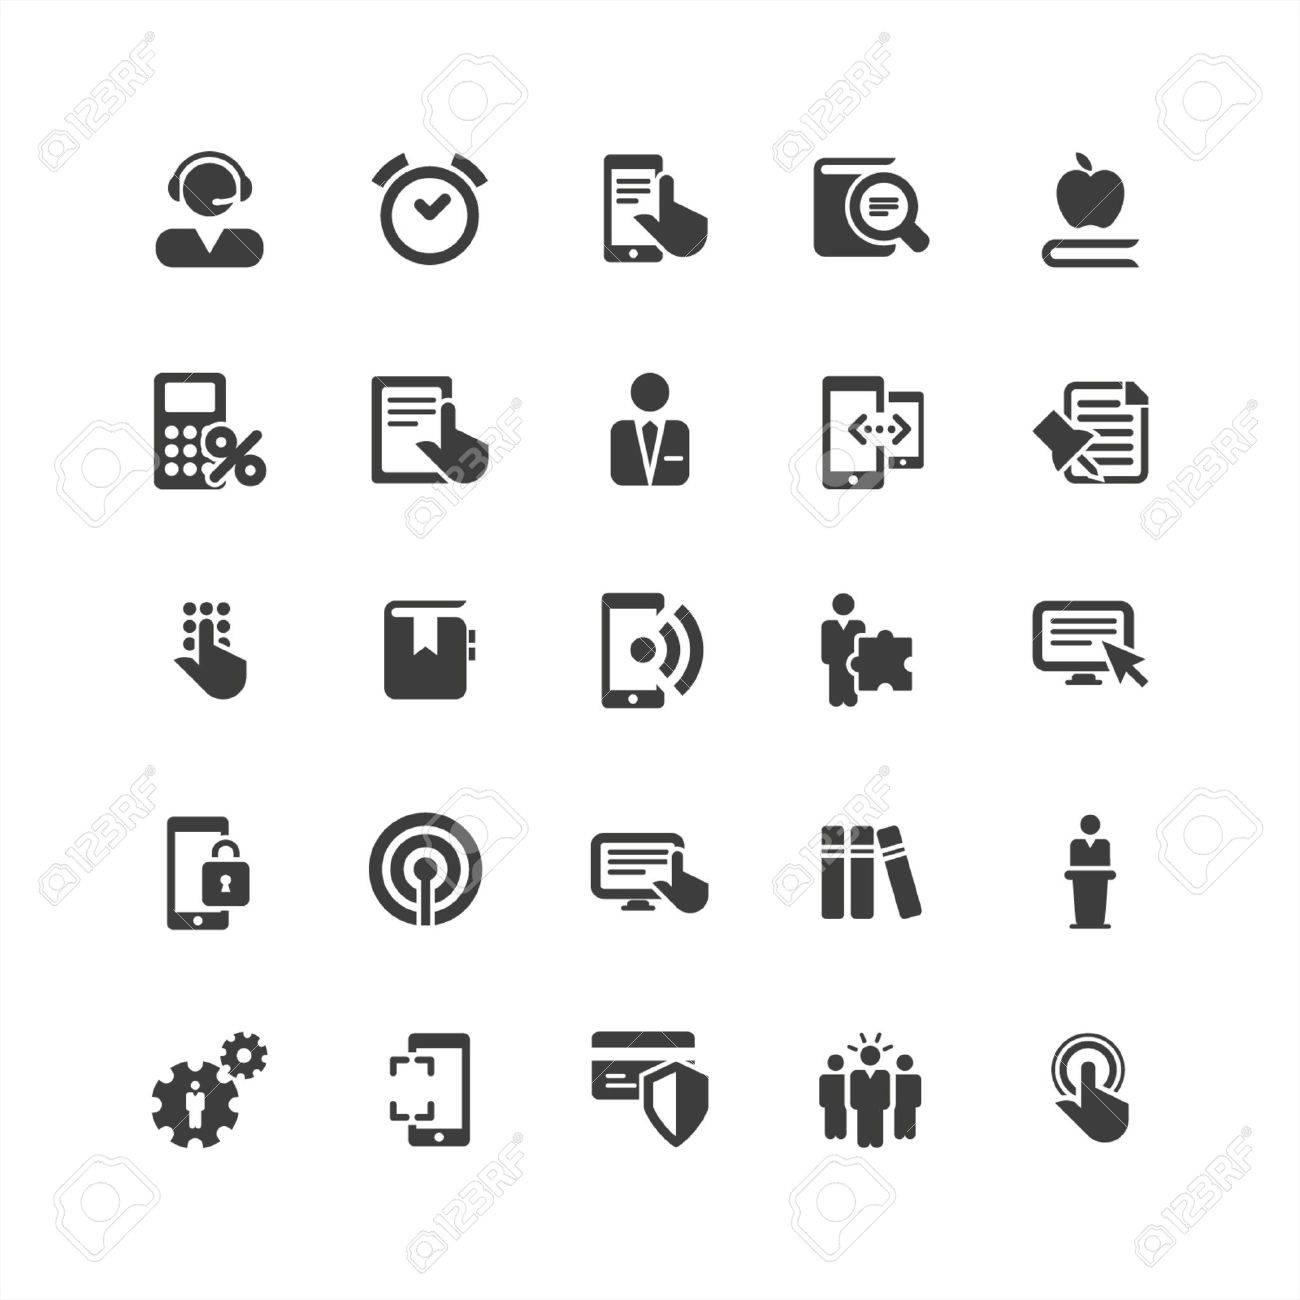 Retina Business Icons Set Stock Vector - 17699982